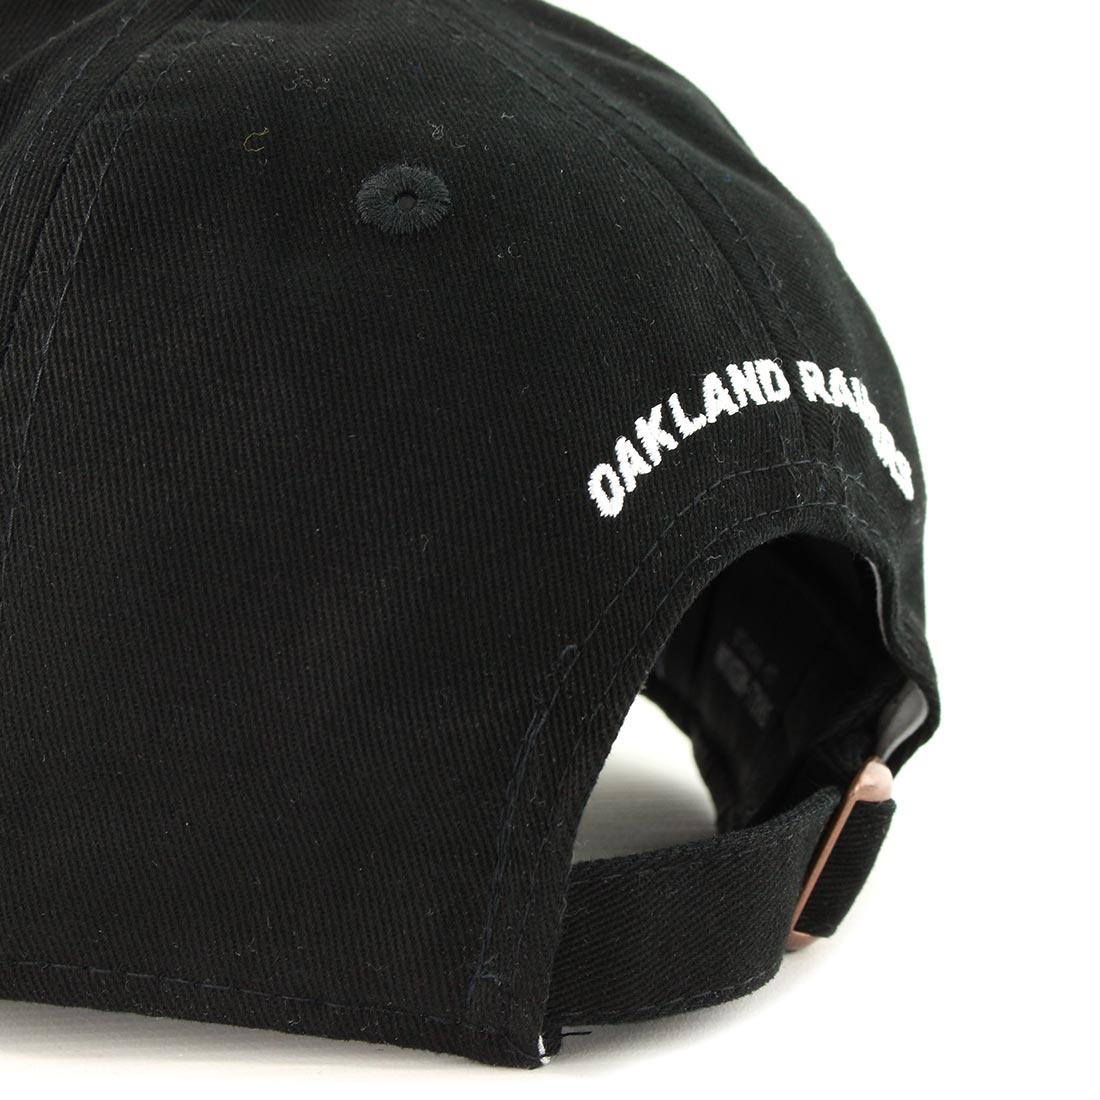 75cea304 New Era Oakland Raiders NFL Badge Low Crown 9Fifty Cap - Black